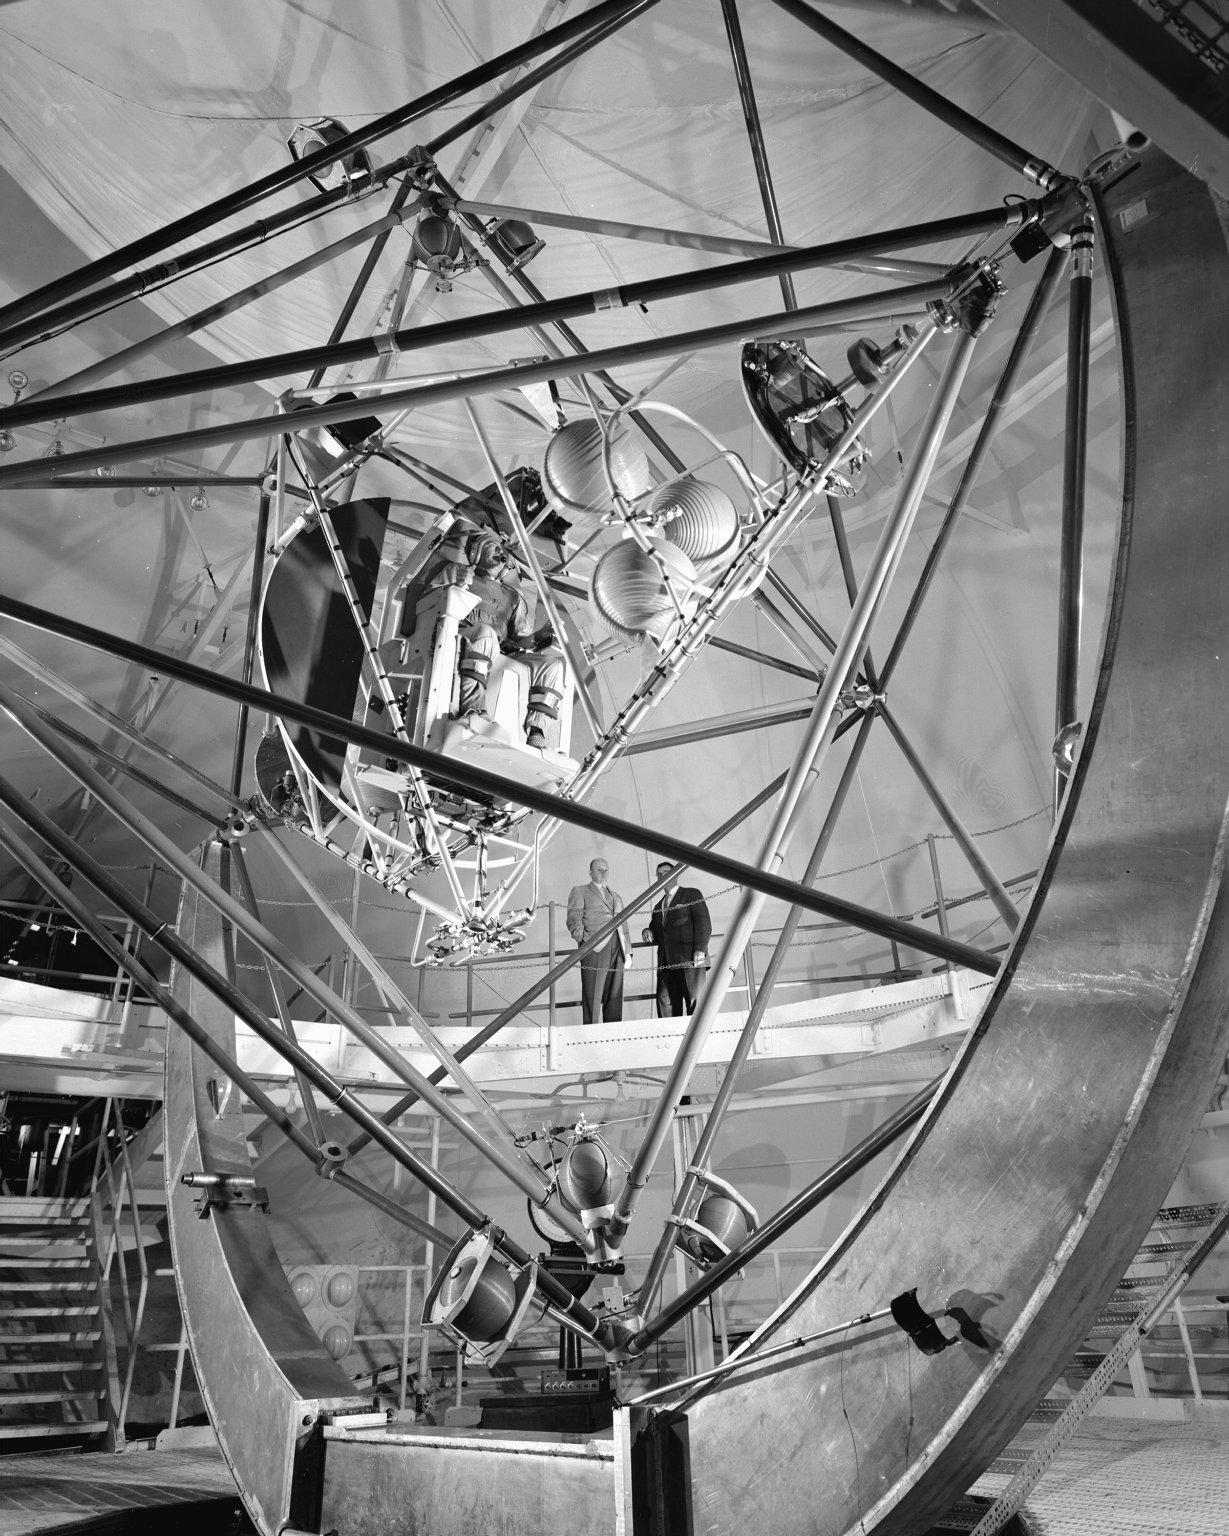 spacecraft yaw - photo #43